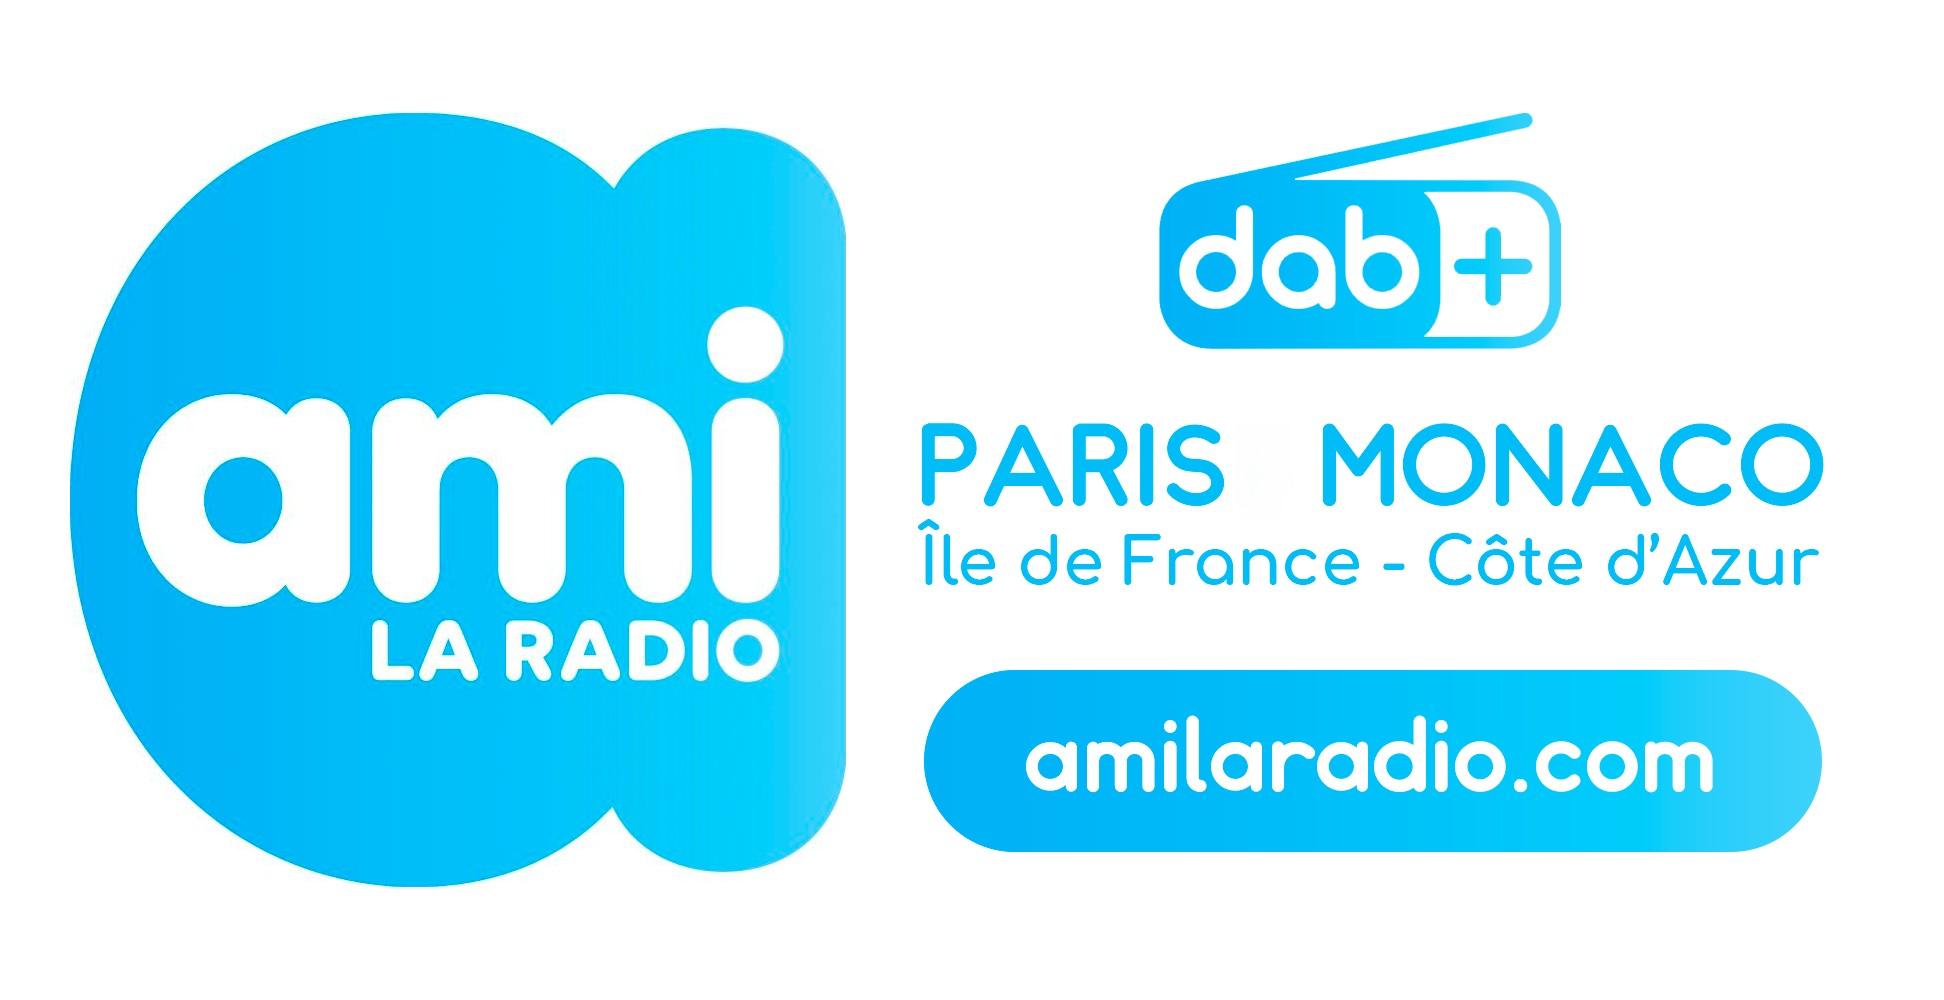 Les ambitions de AMI la Radio sur le DAB+